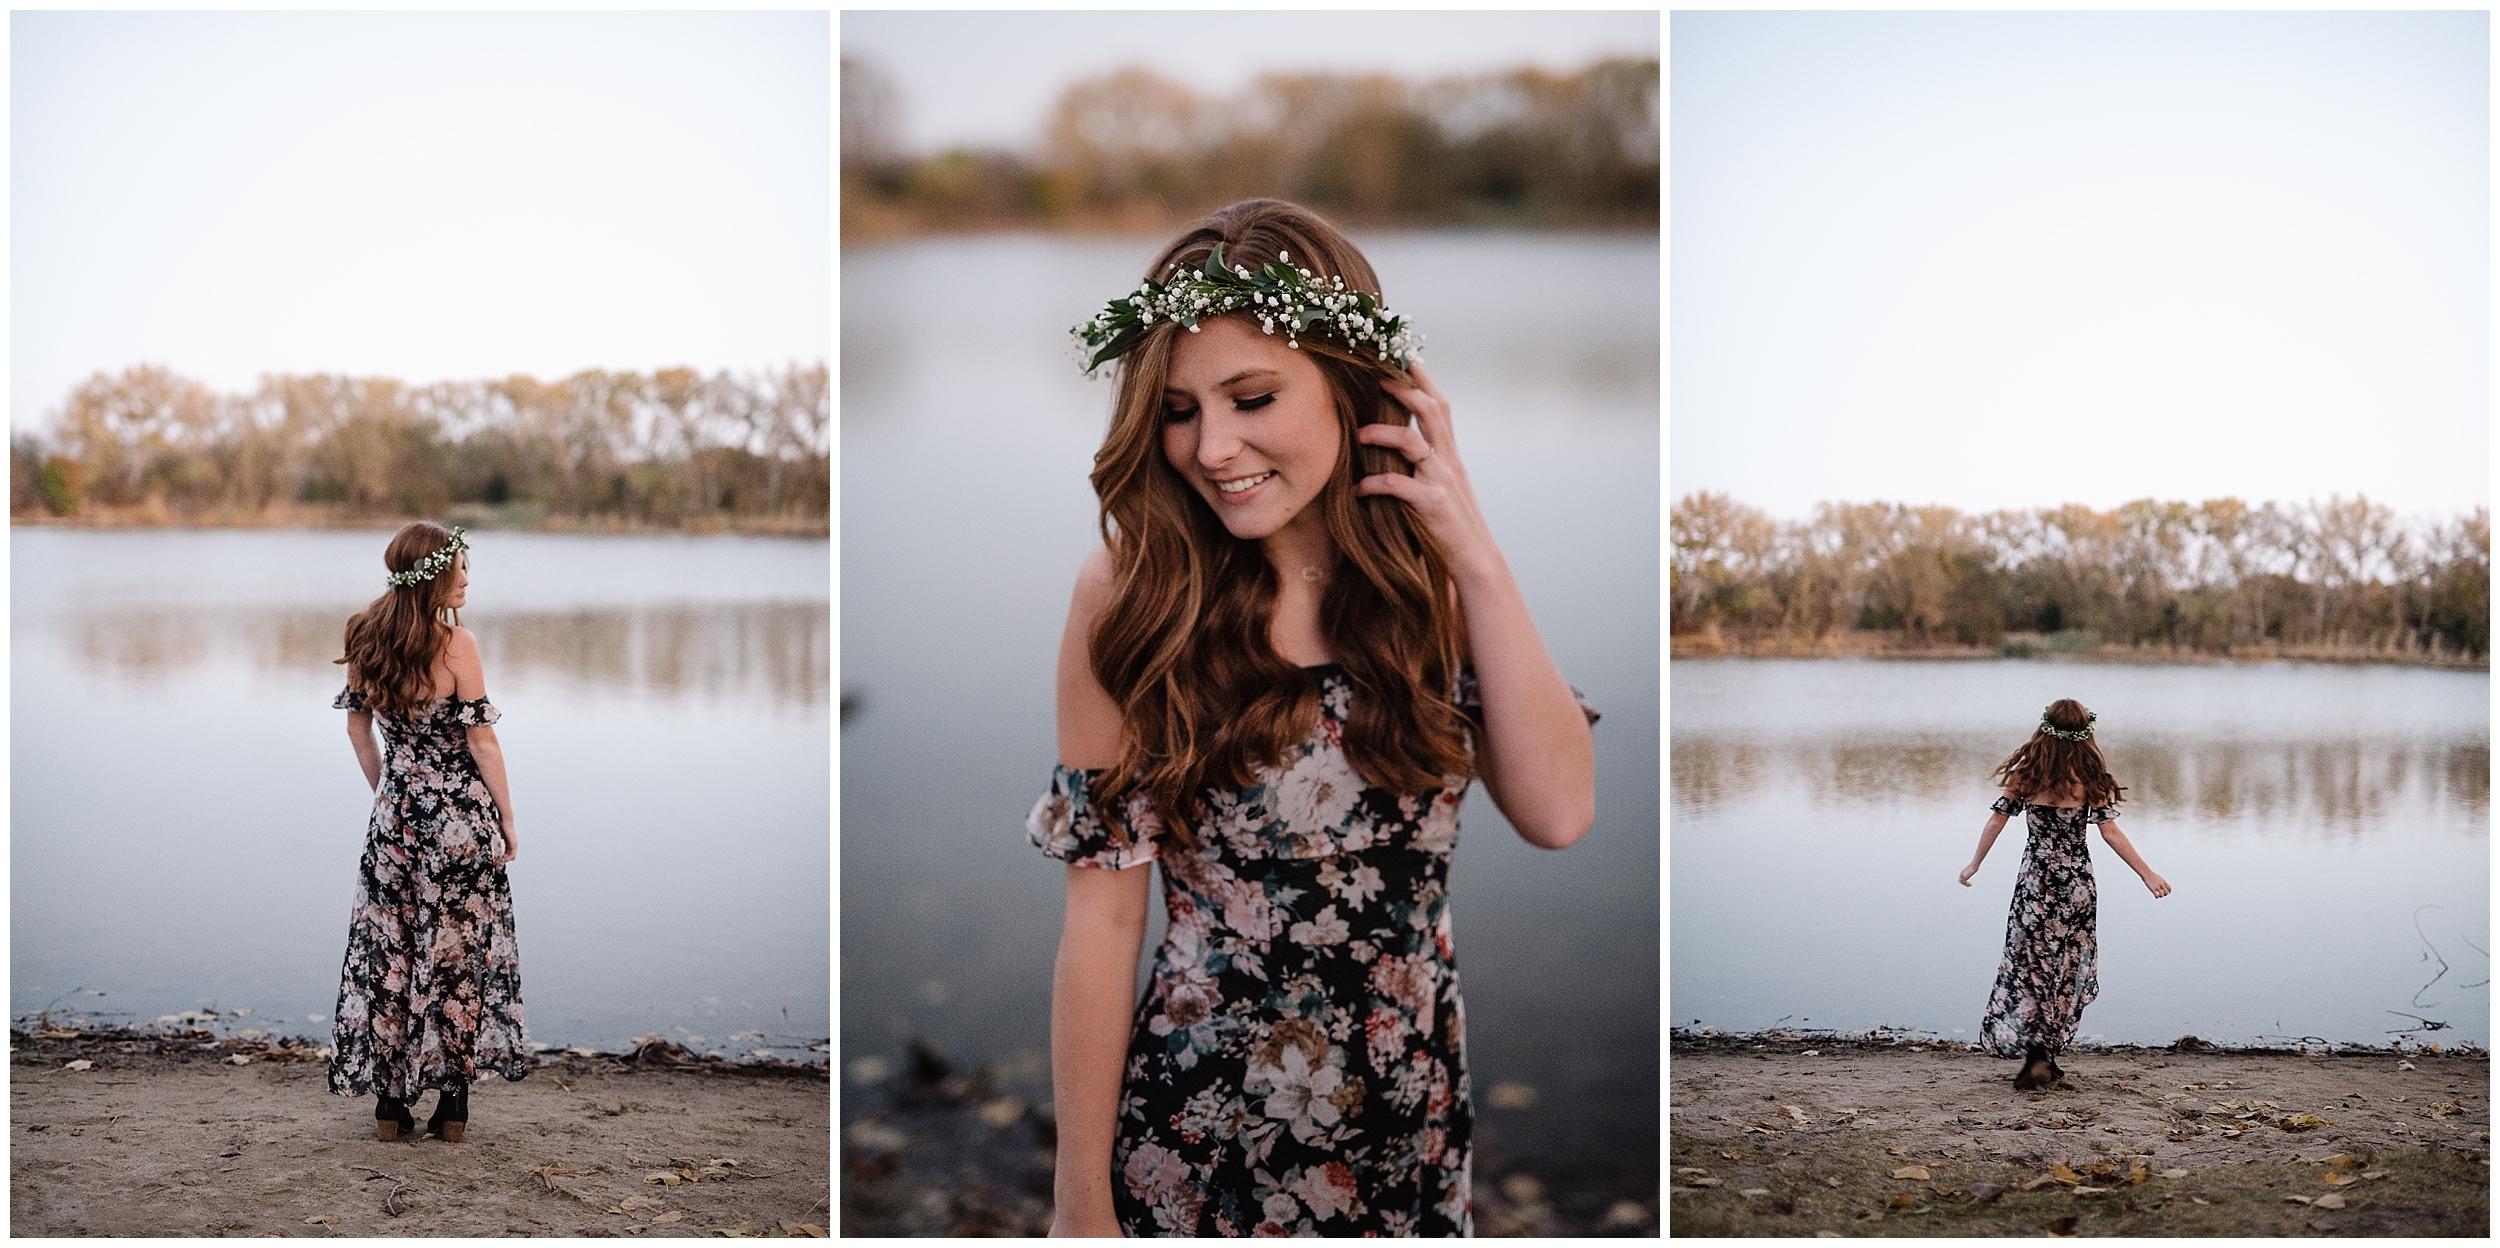 oklahoma wedding photographer portrait senior high school outdoor beautiful nature wichita kansas water lake flower crown